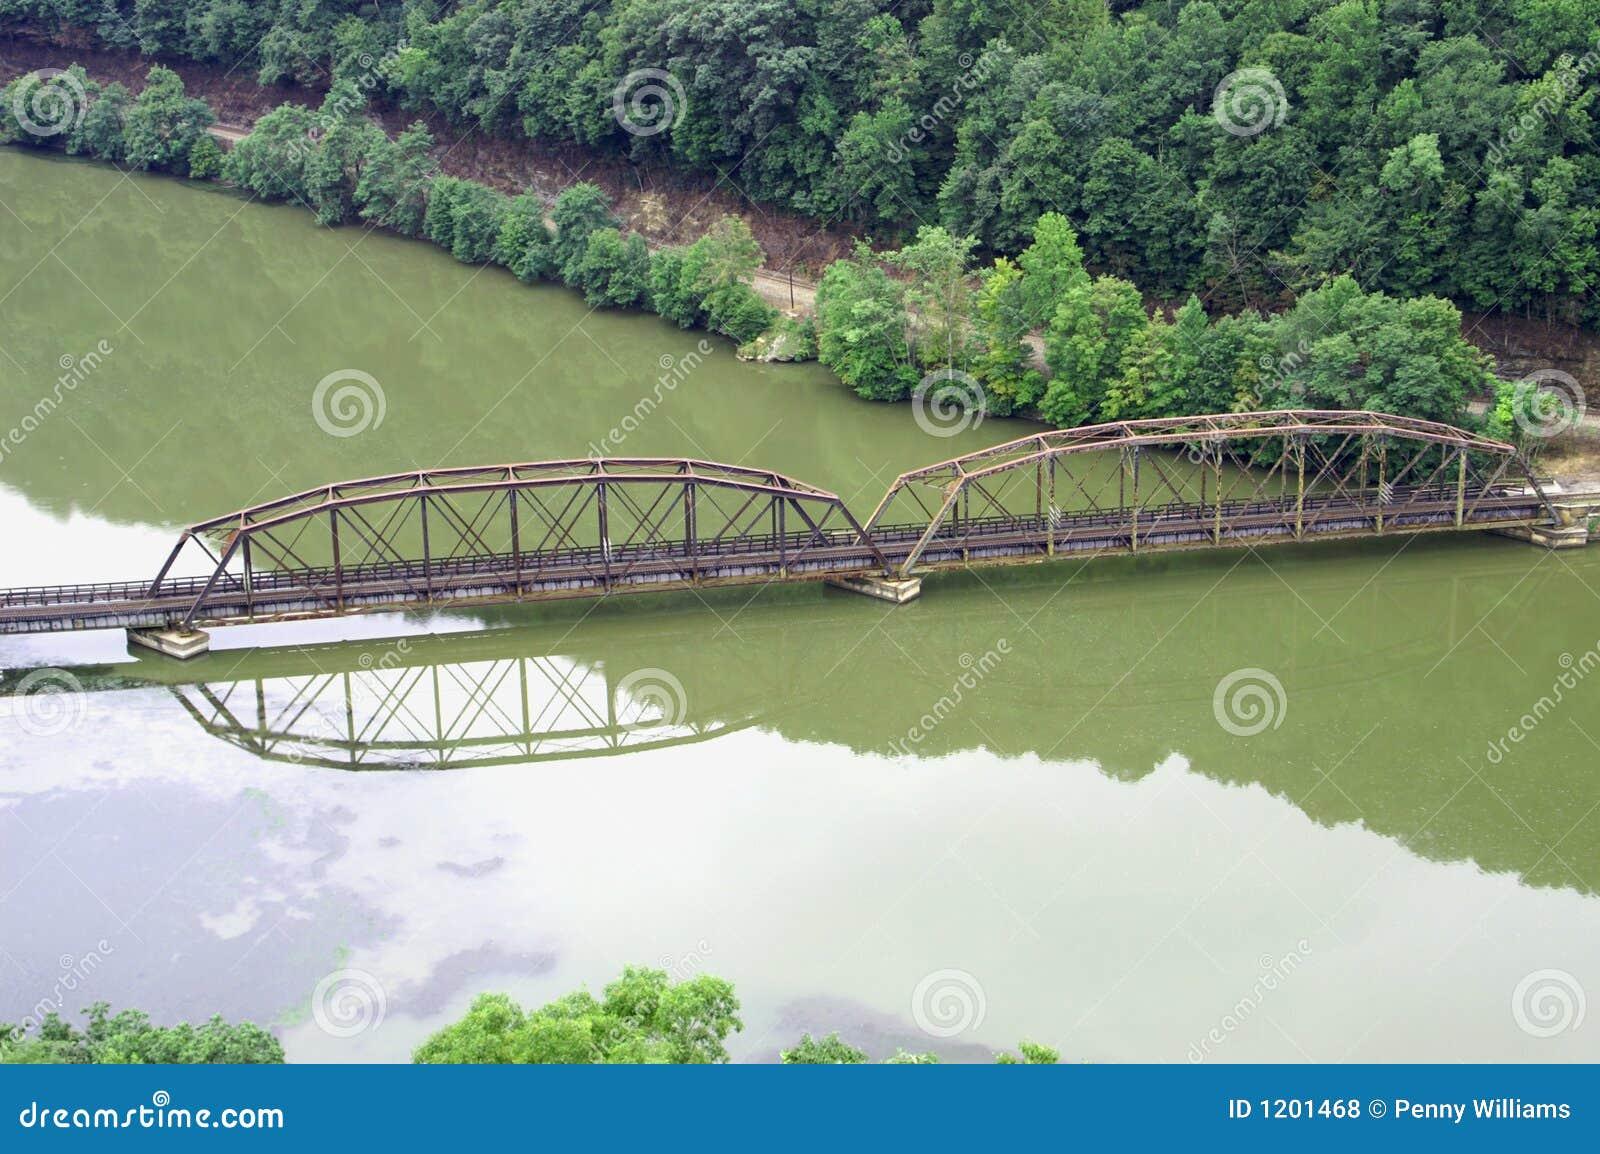 Fayetteville Station Bridge